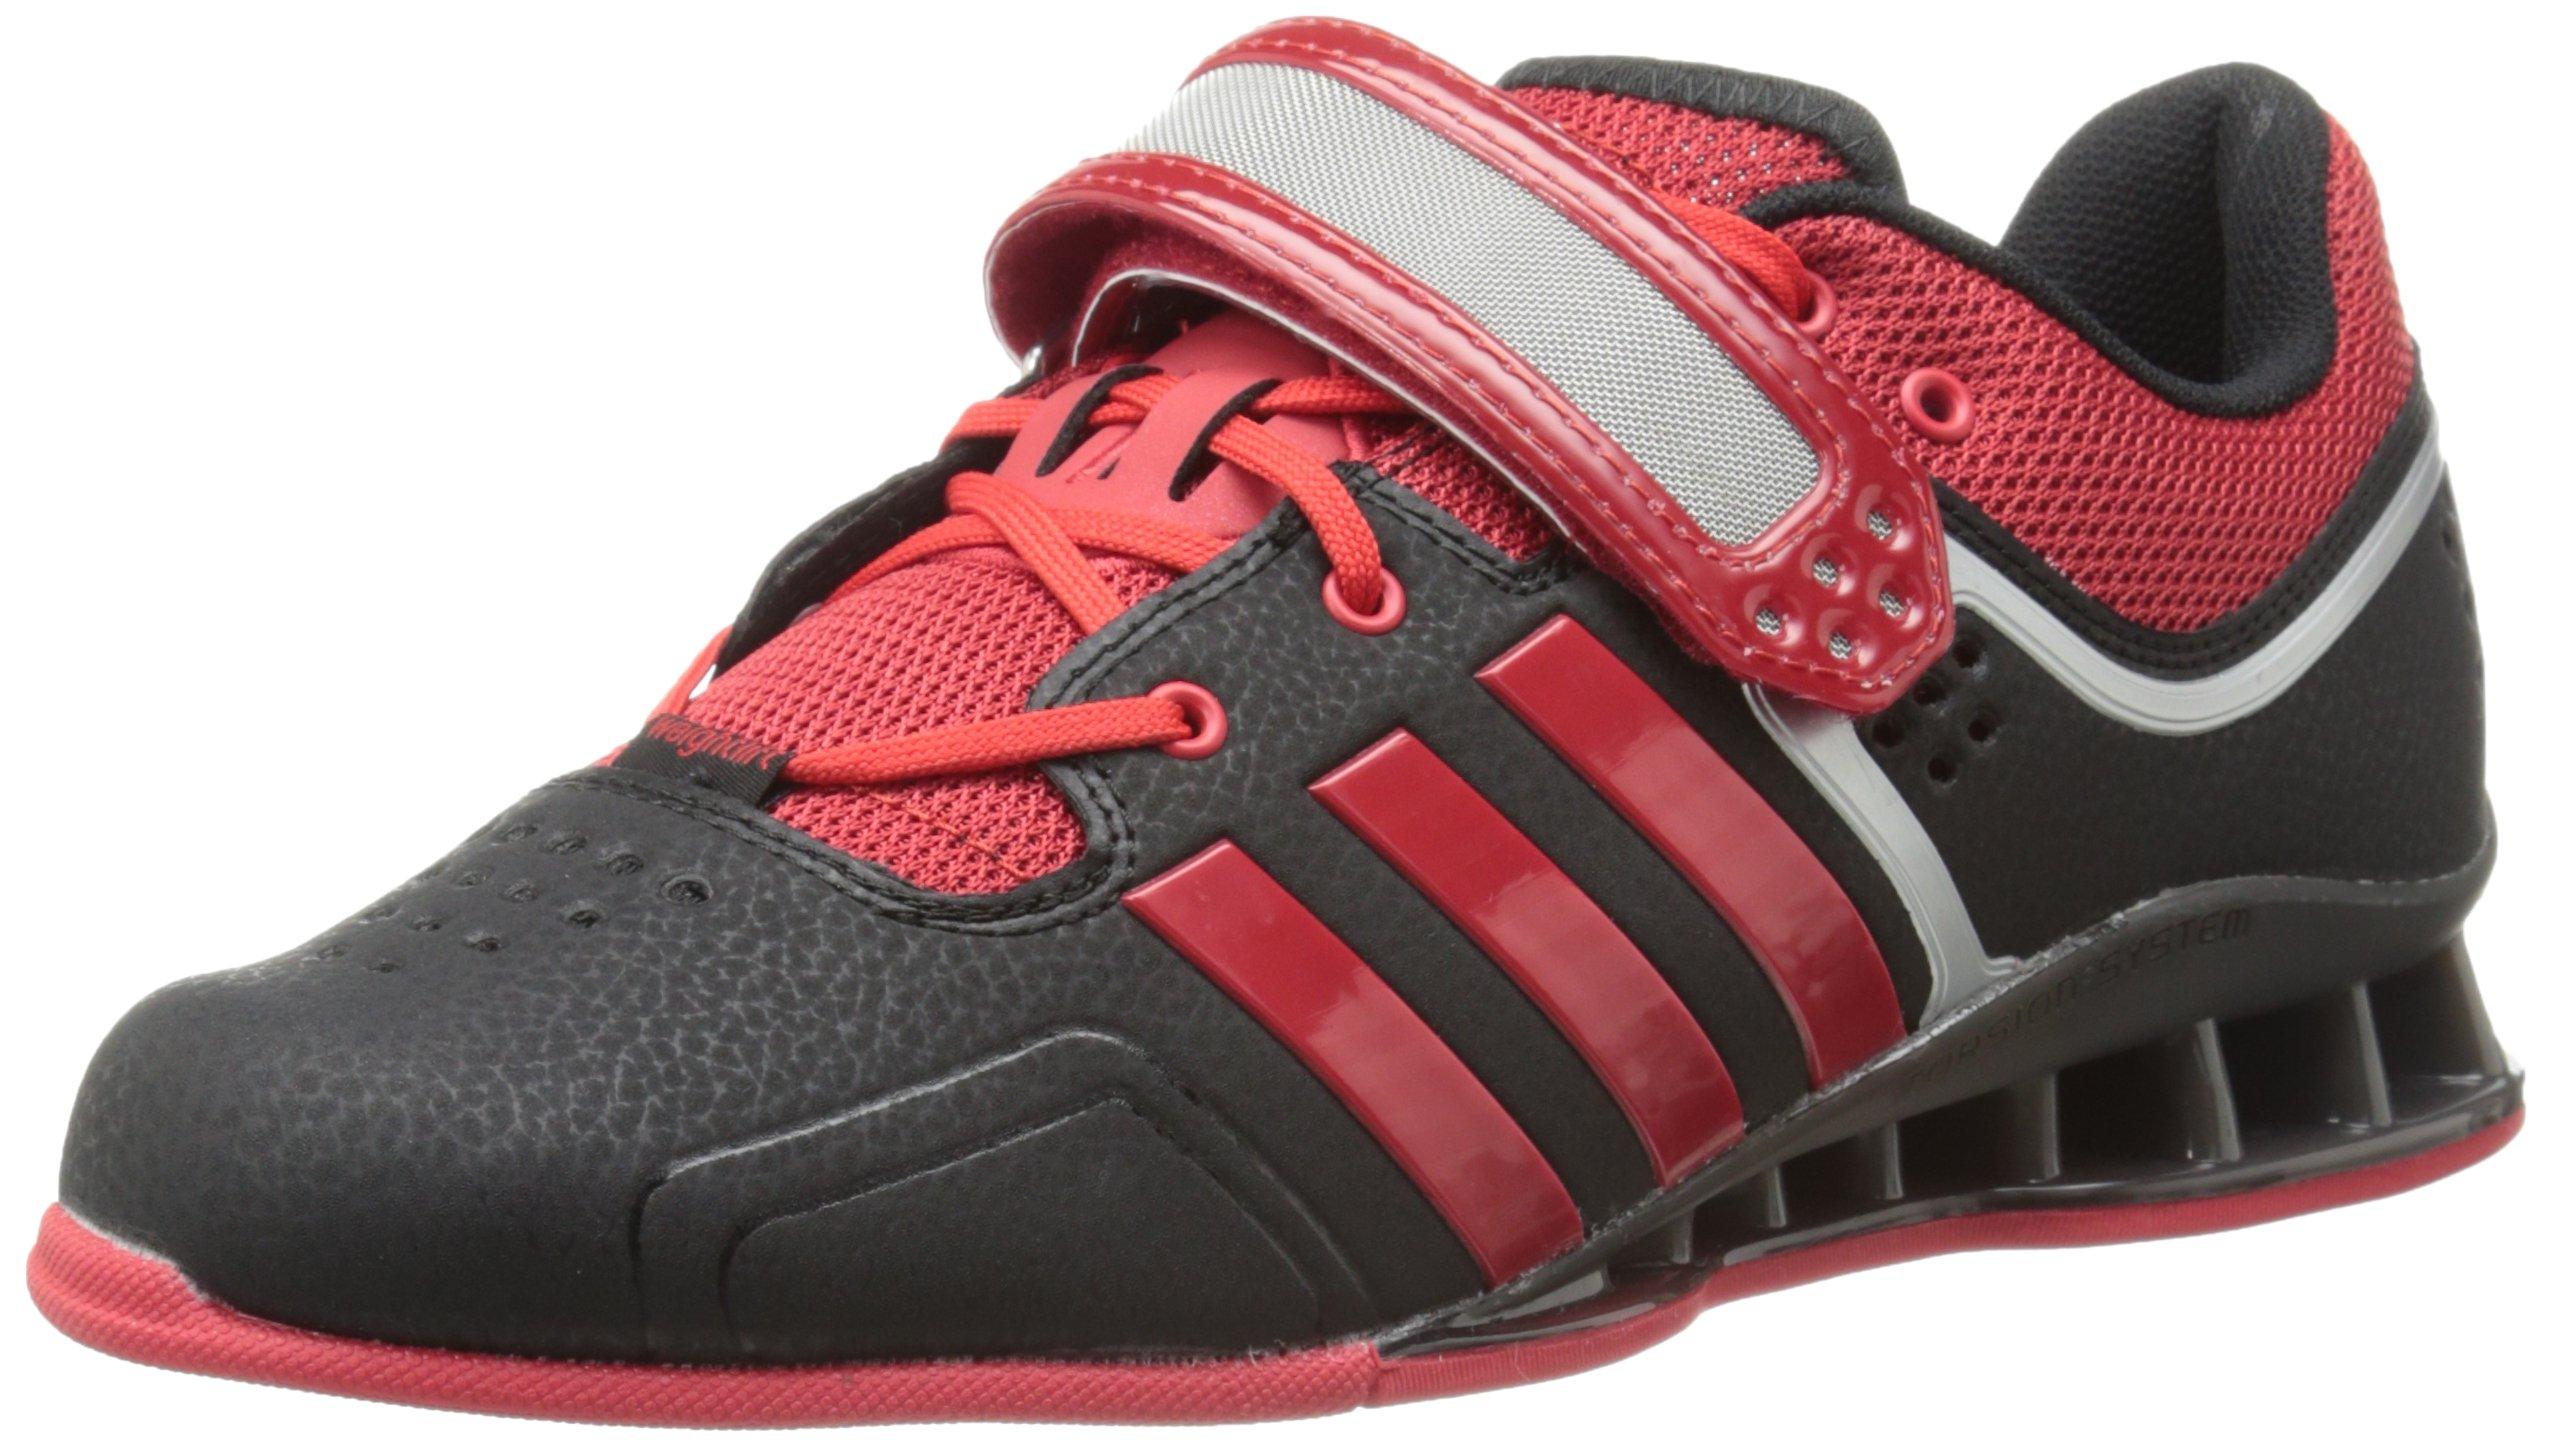 adidas Performance Adipower Weightlifting Trainer Shoe,Black/Light Scarlet/Tech Grey,15 M US